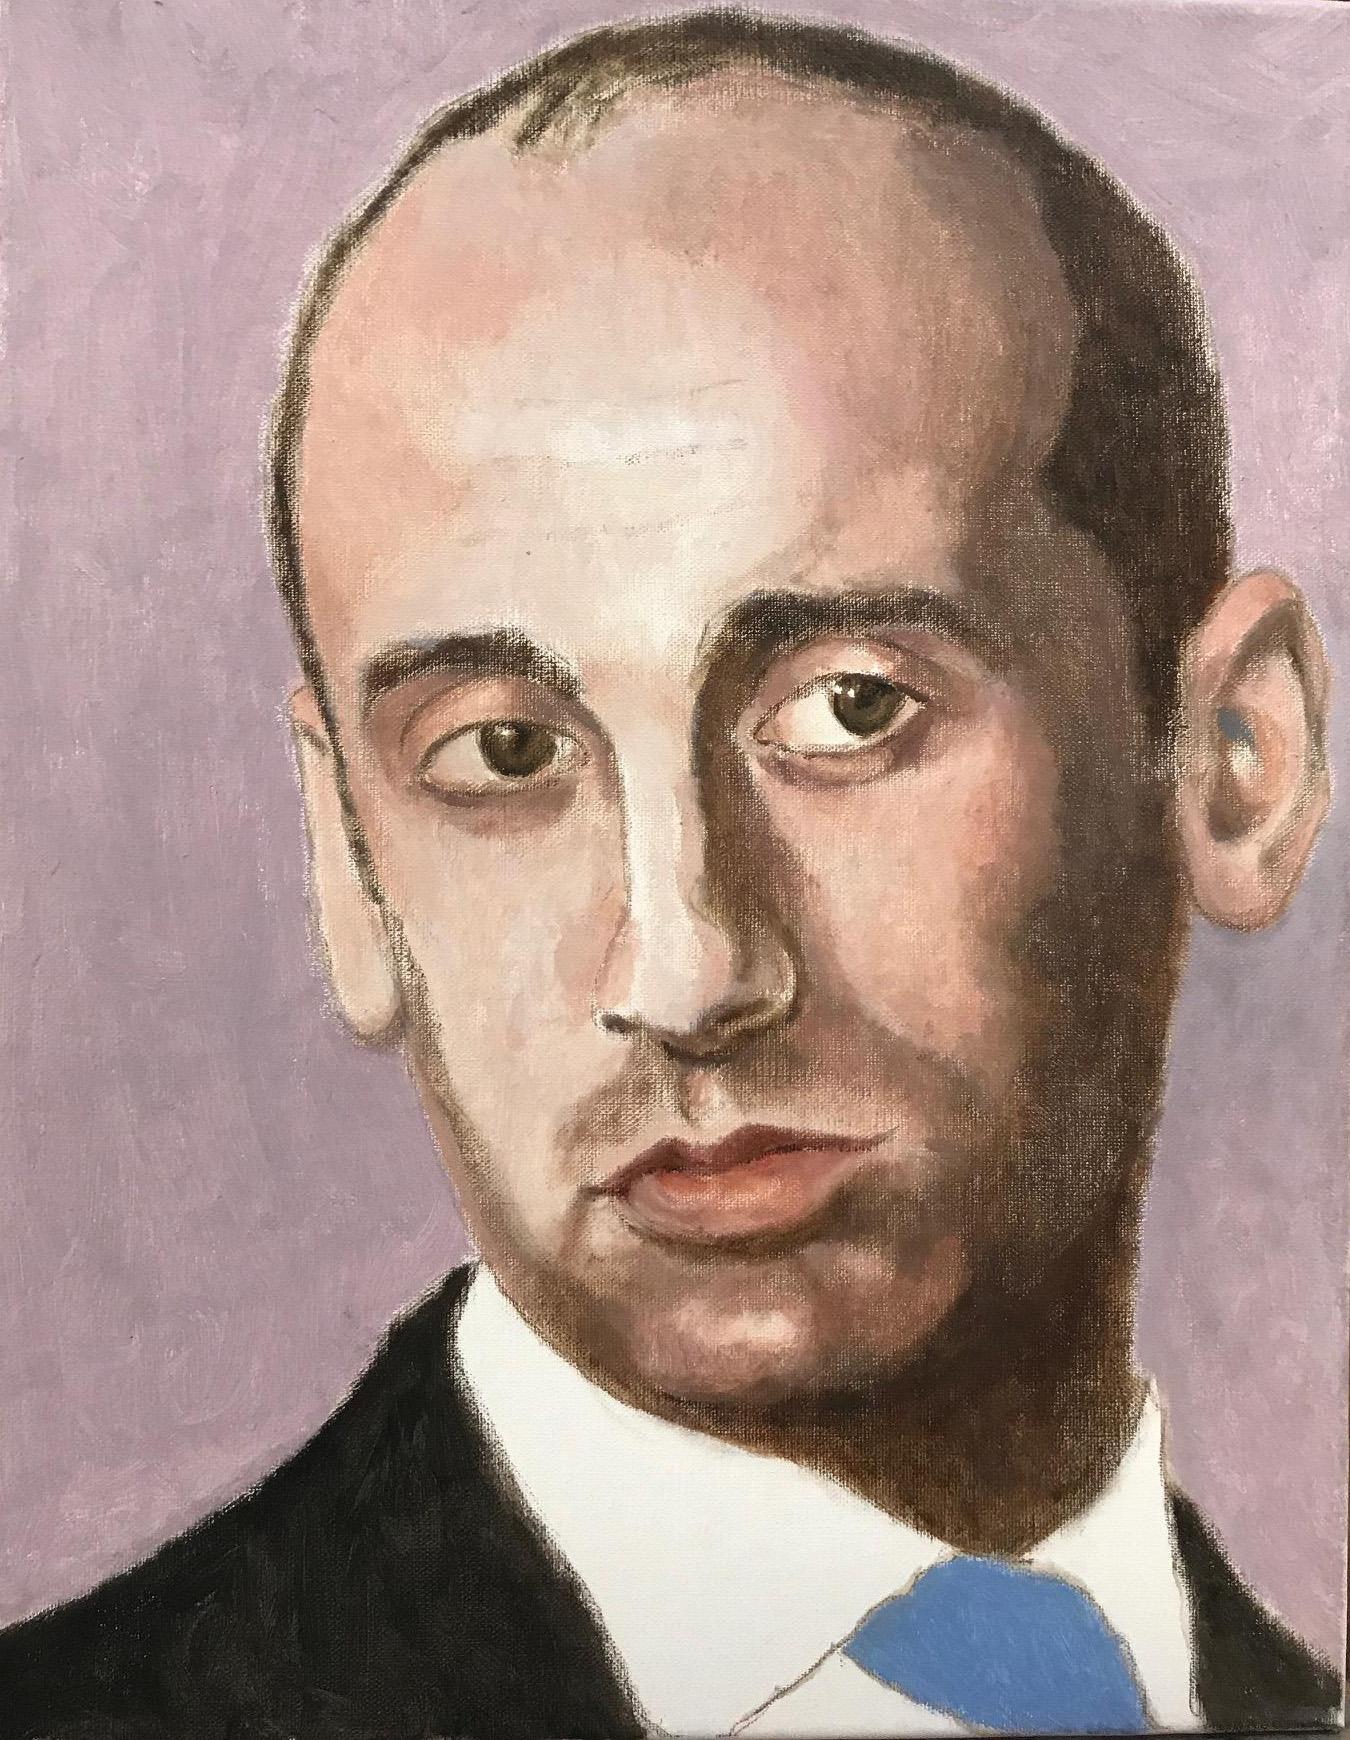 stephen-miller-portrait-artprofiler